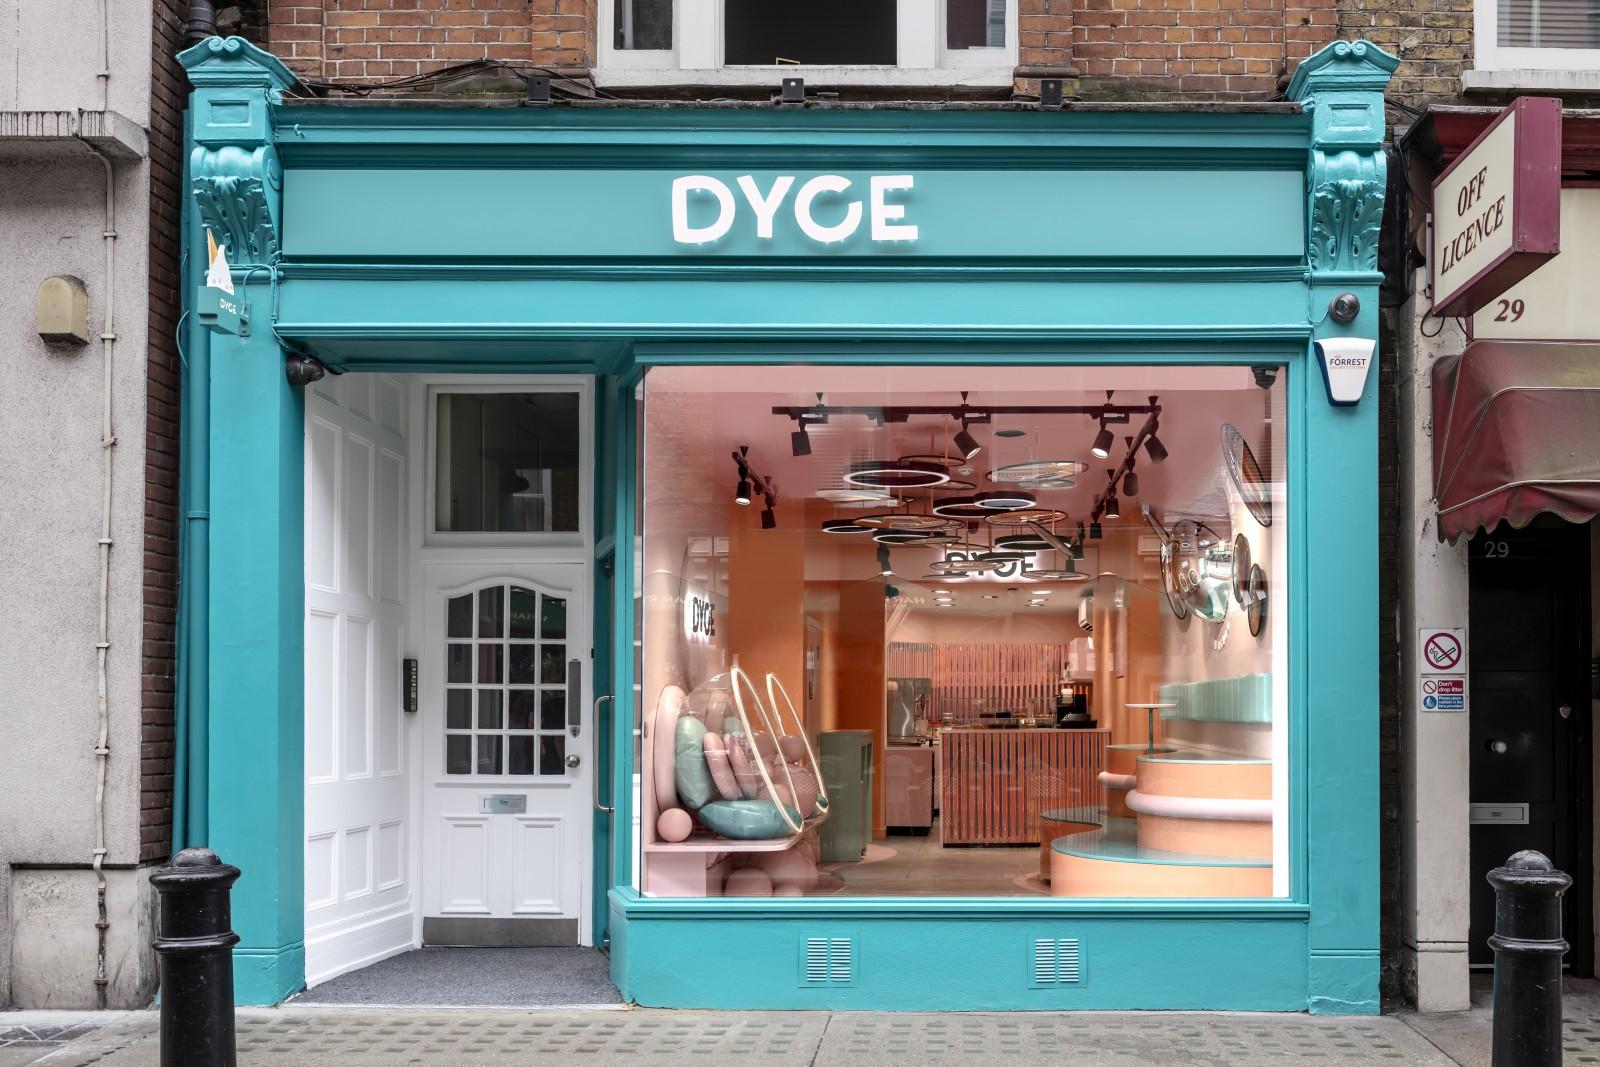 FormRoom Creates Interior Brand Identity for Dyce Ice Cream Shop